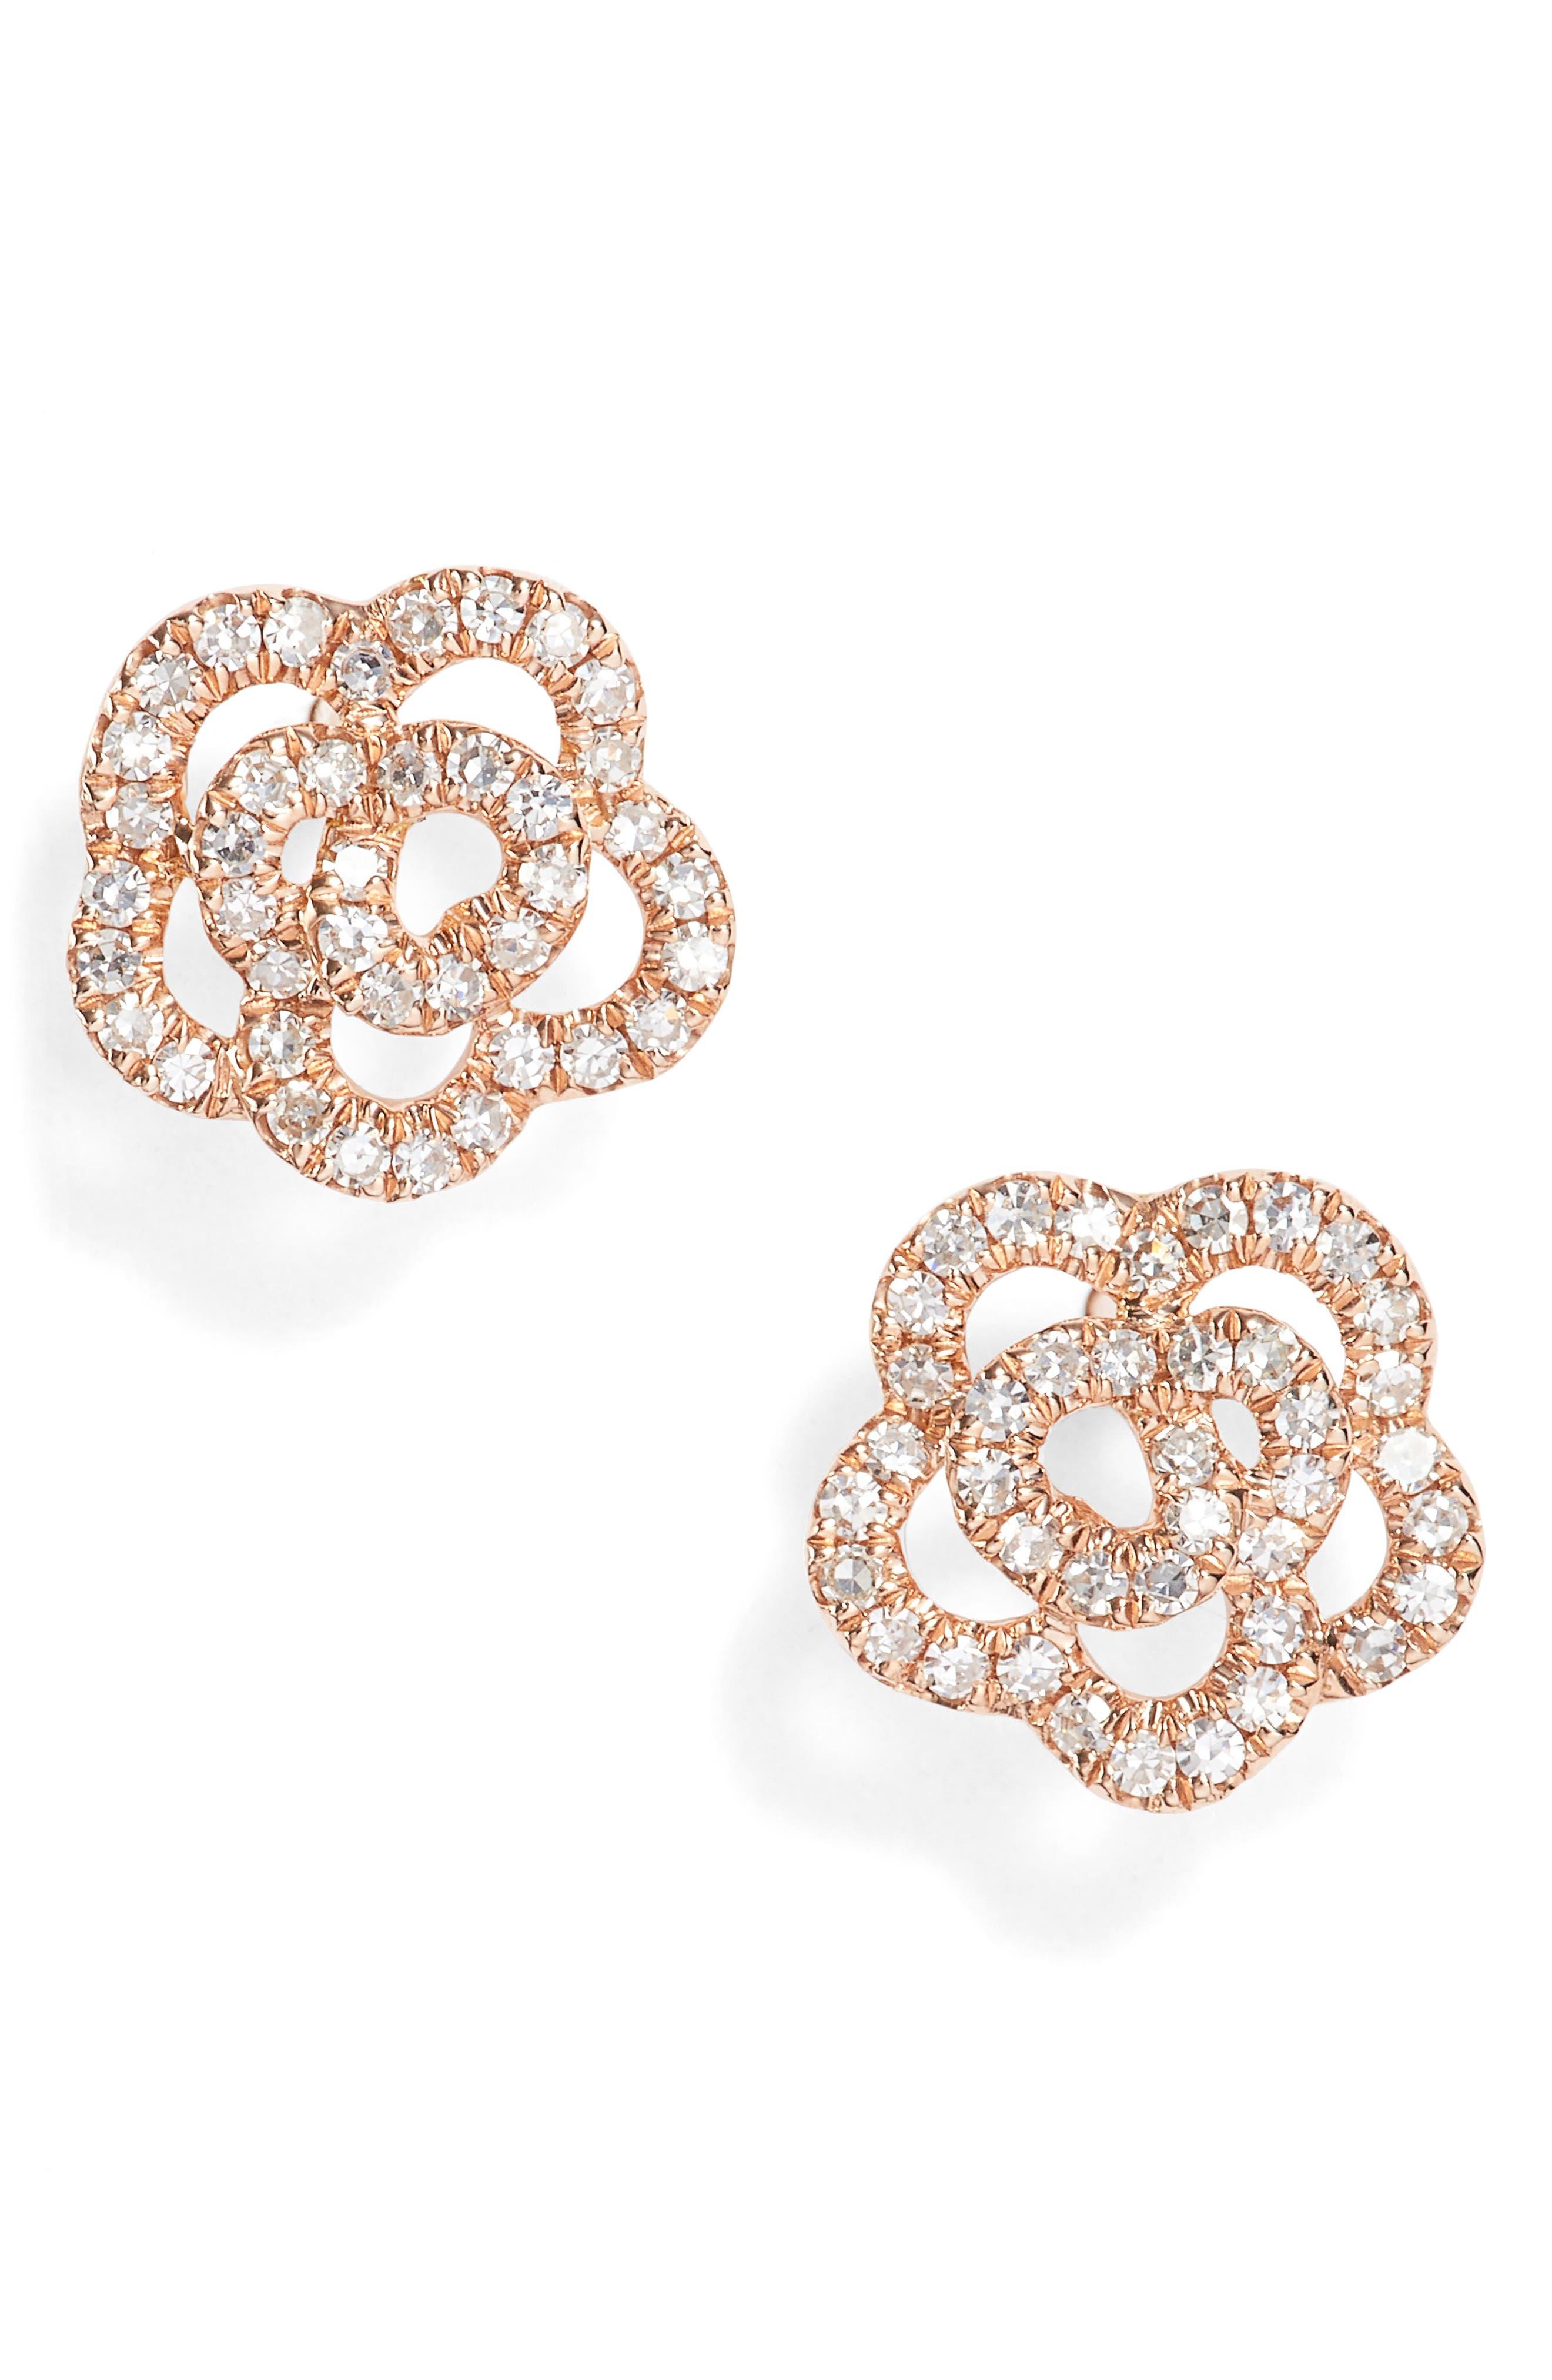 Rose Diamond Stud Earrings,                         Main,                         color, Rose Gold